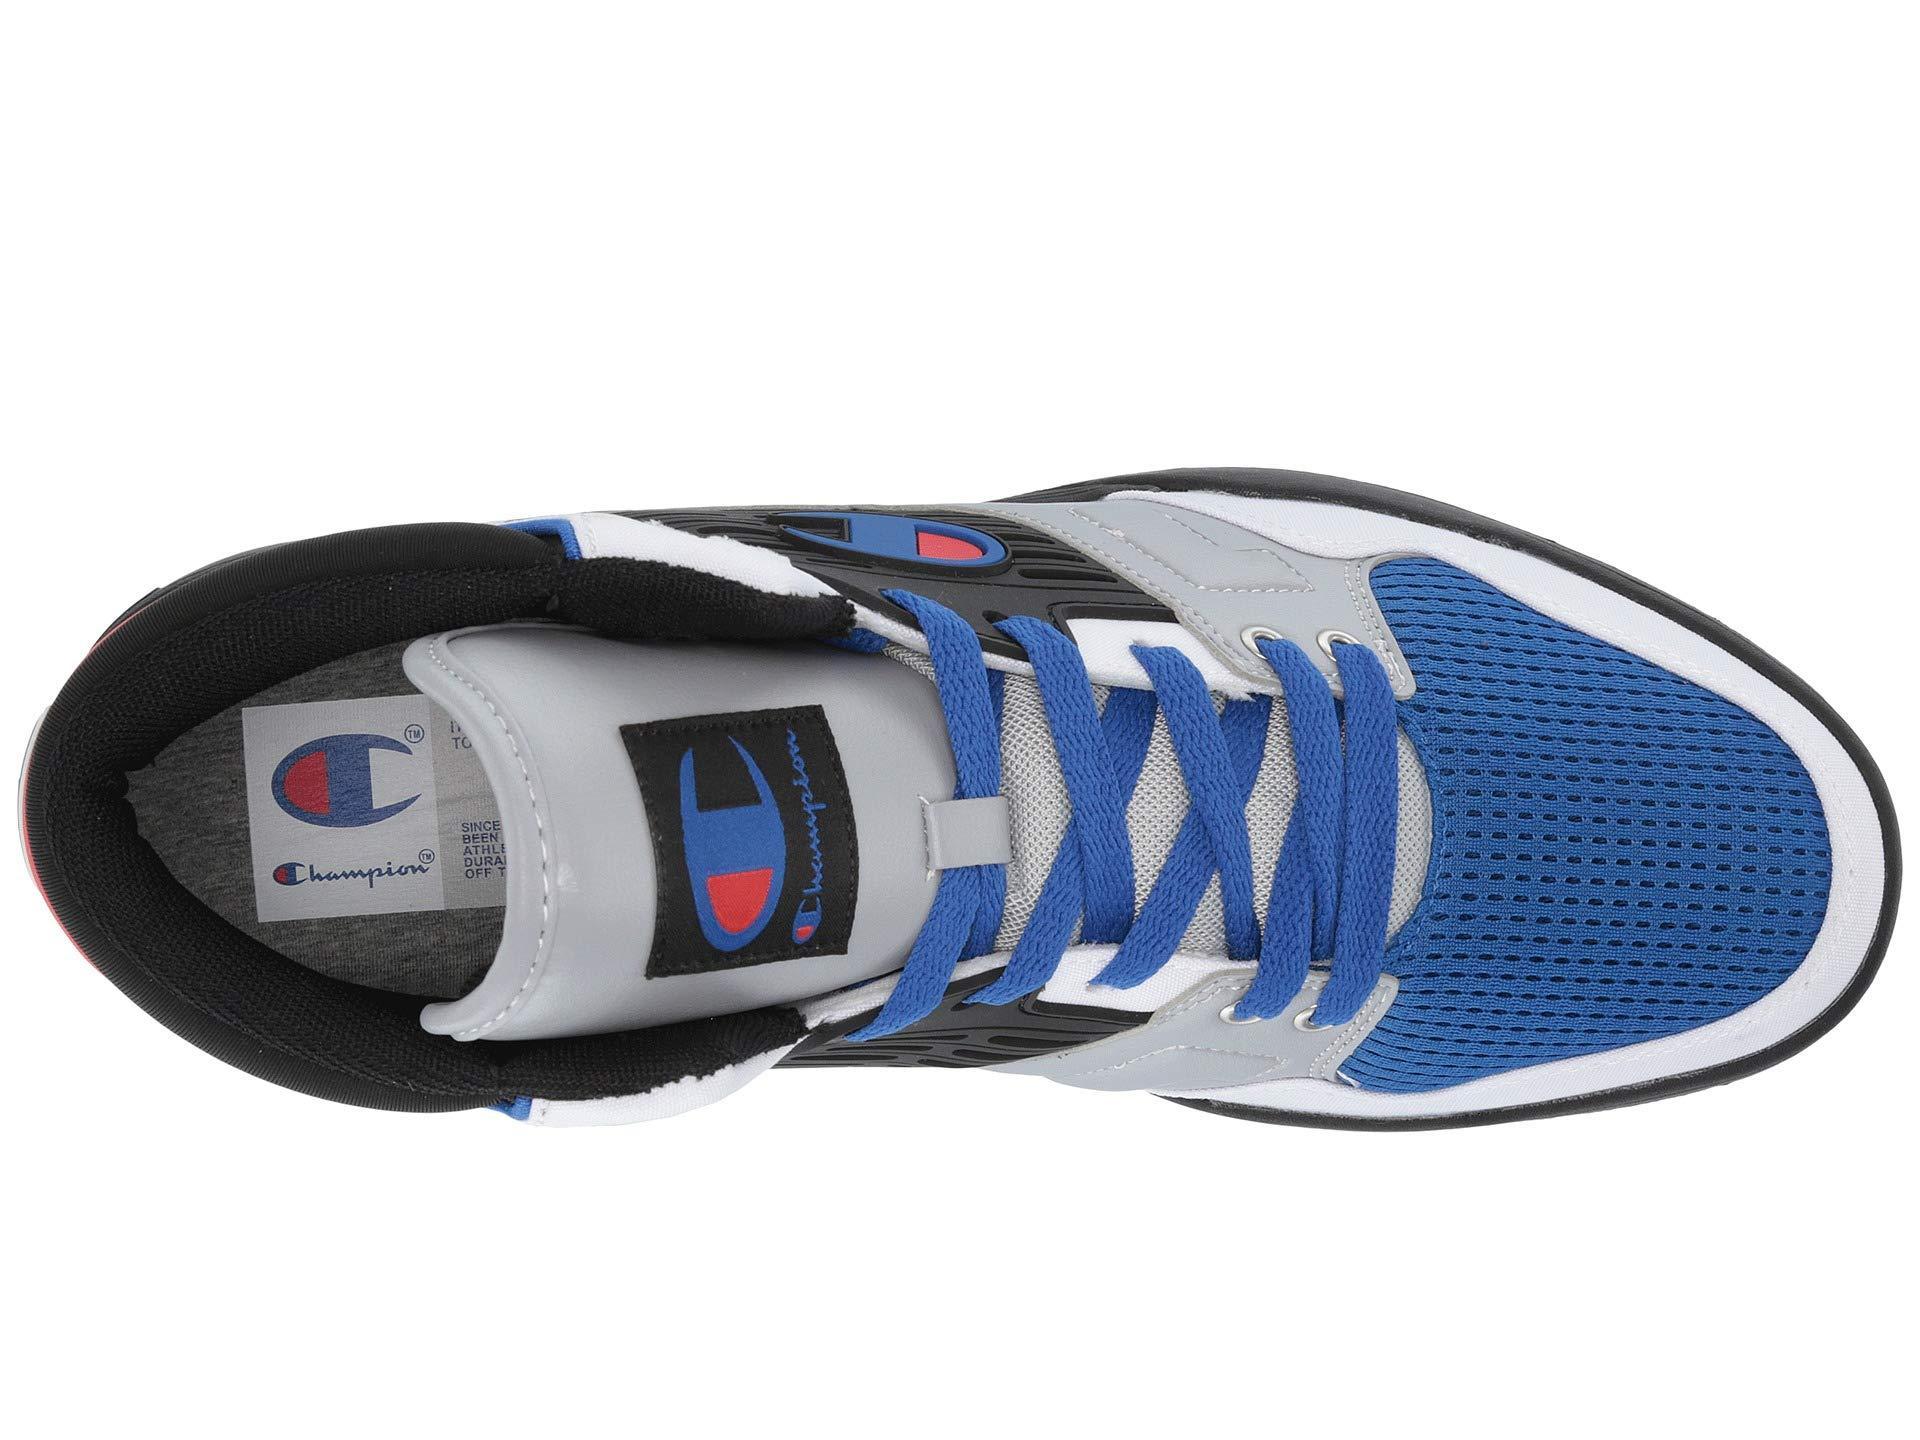 7ab35faaafb4f Champion - 3 On 3 Sp Block (black Multi) Men s Classic Shoes for Men. View  fullscreen